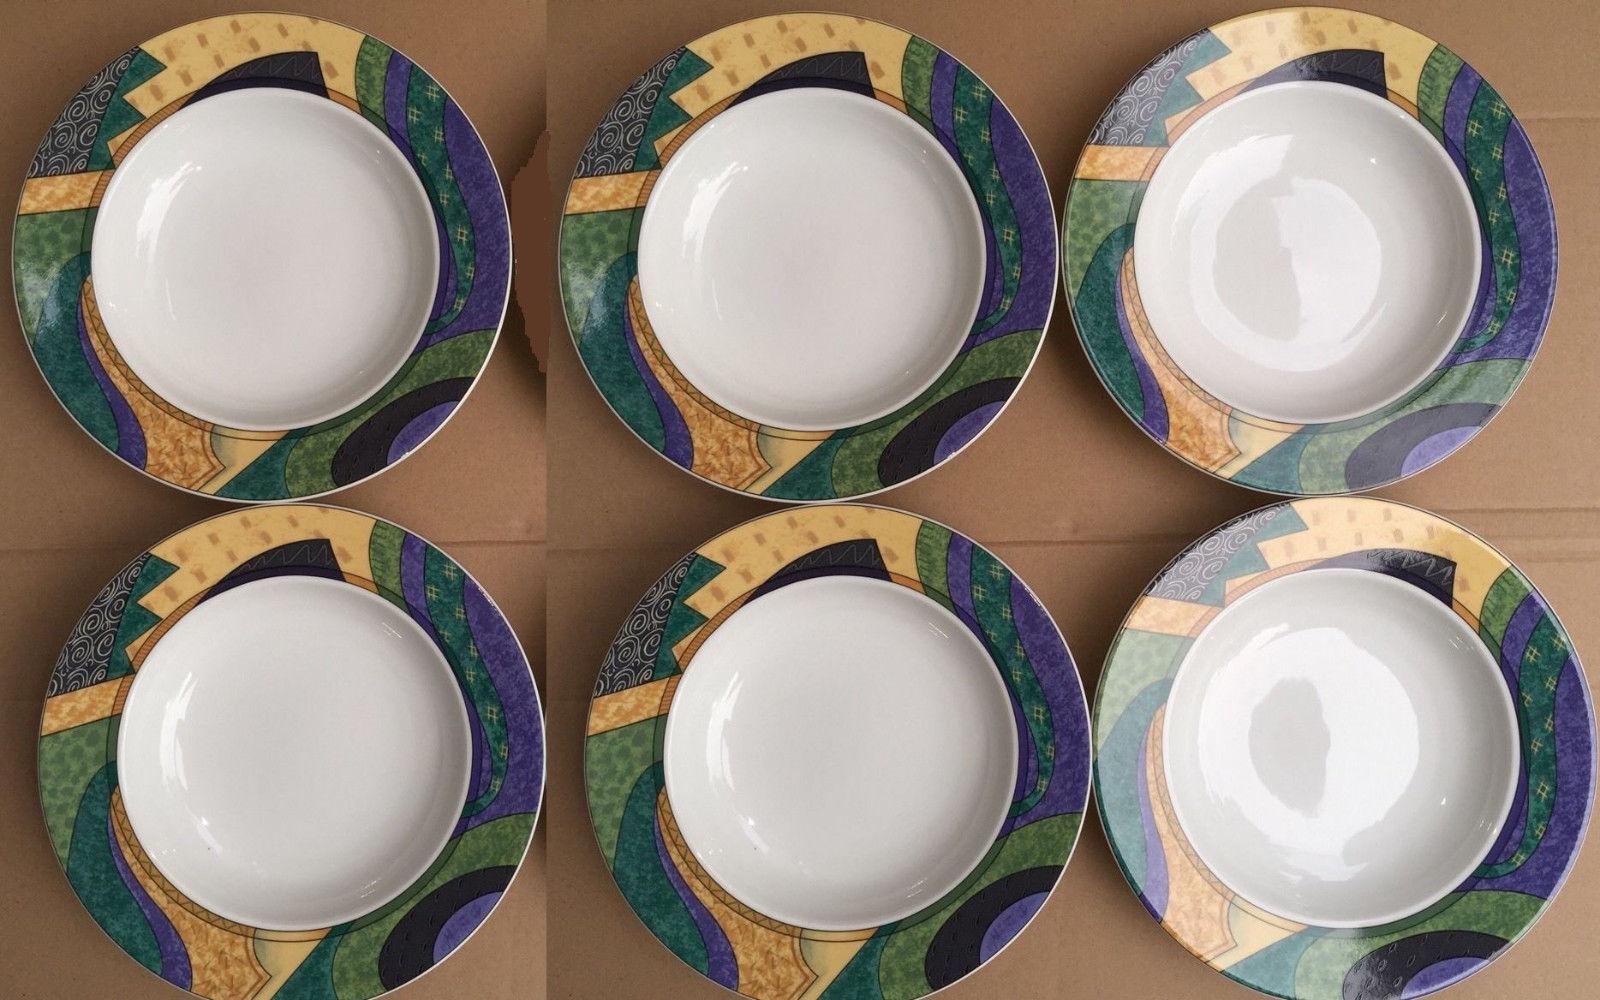 Set of 6 Studio Nova Concepts Y0254 Rim Soup Pasta Bowls Geometric Design ST816 - $43.37 · Advanced search for Studio Nova China & Studio Nova China: 29 listings